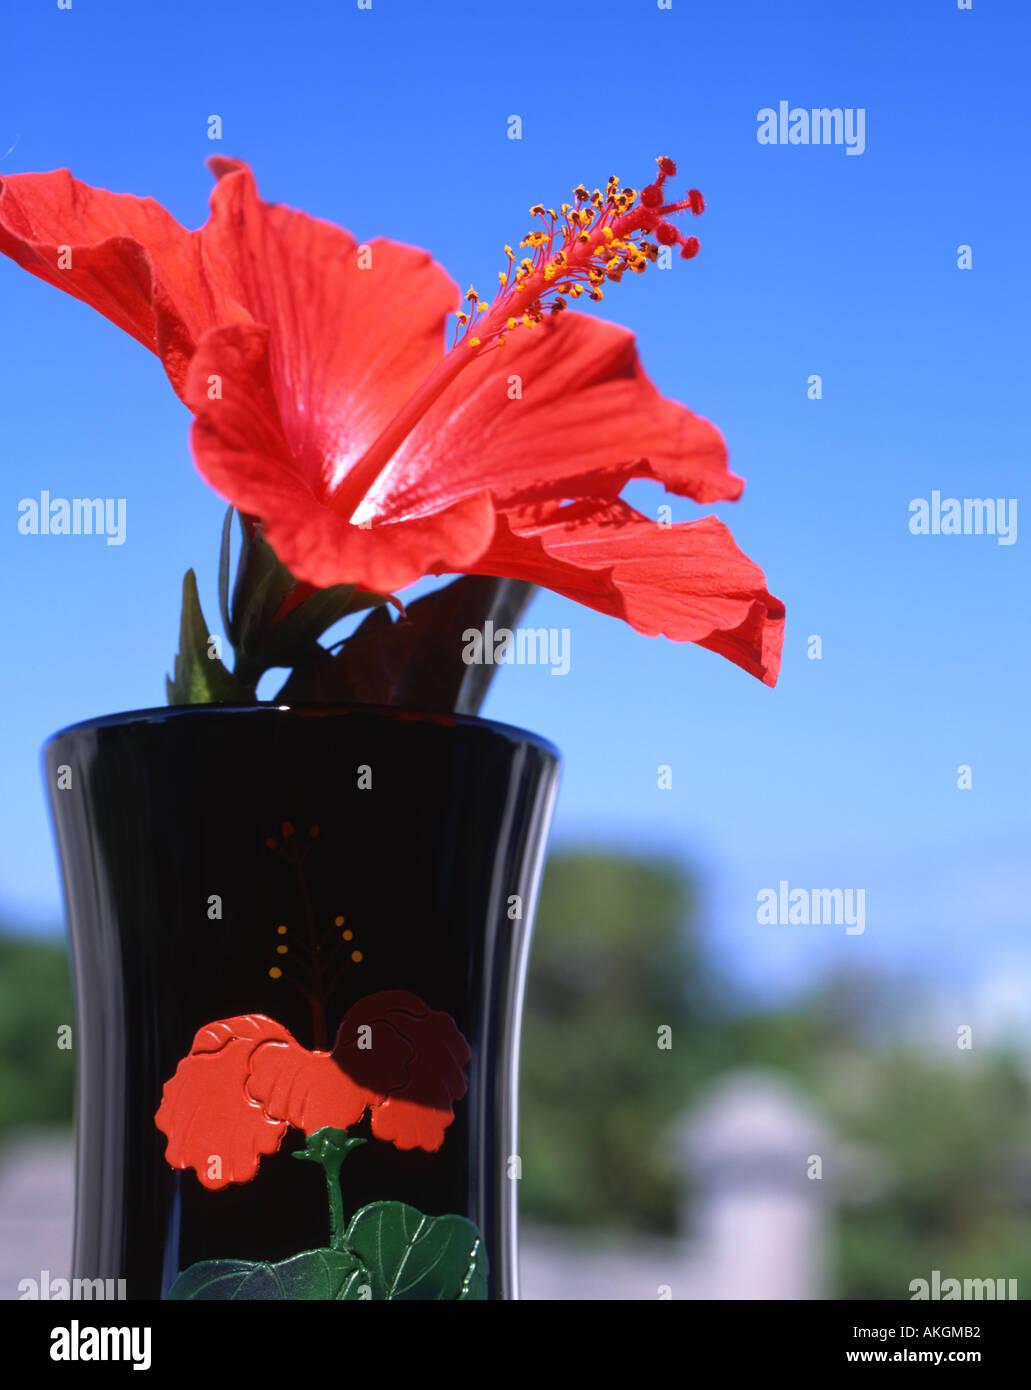 Hibiscus Flower In Vase In Stock Photos Hibiscus Flower In Vase In